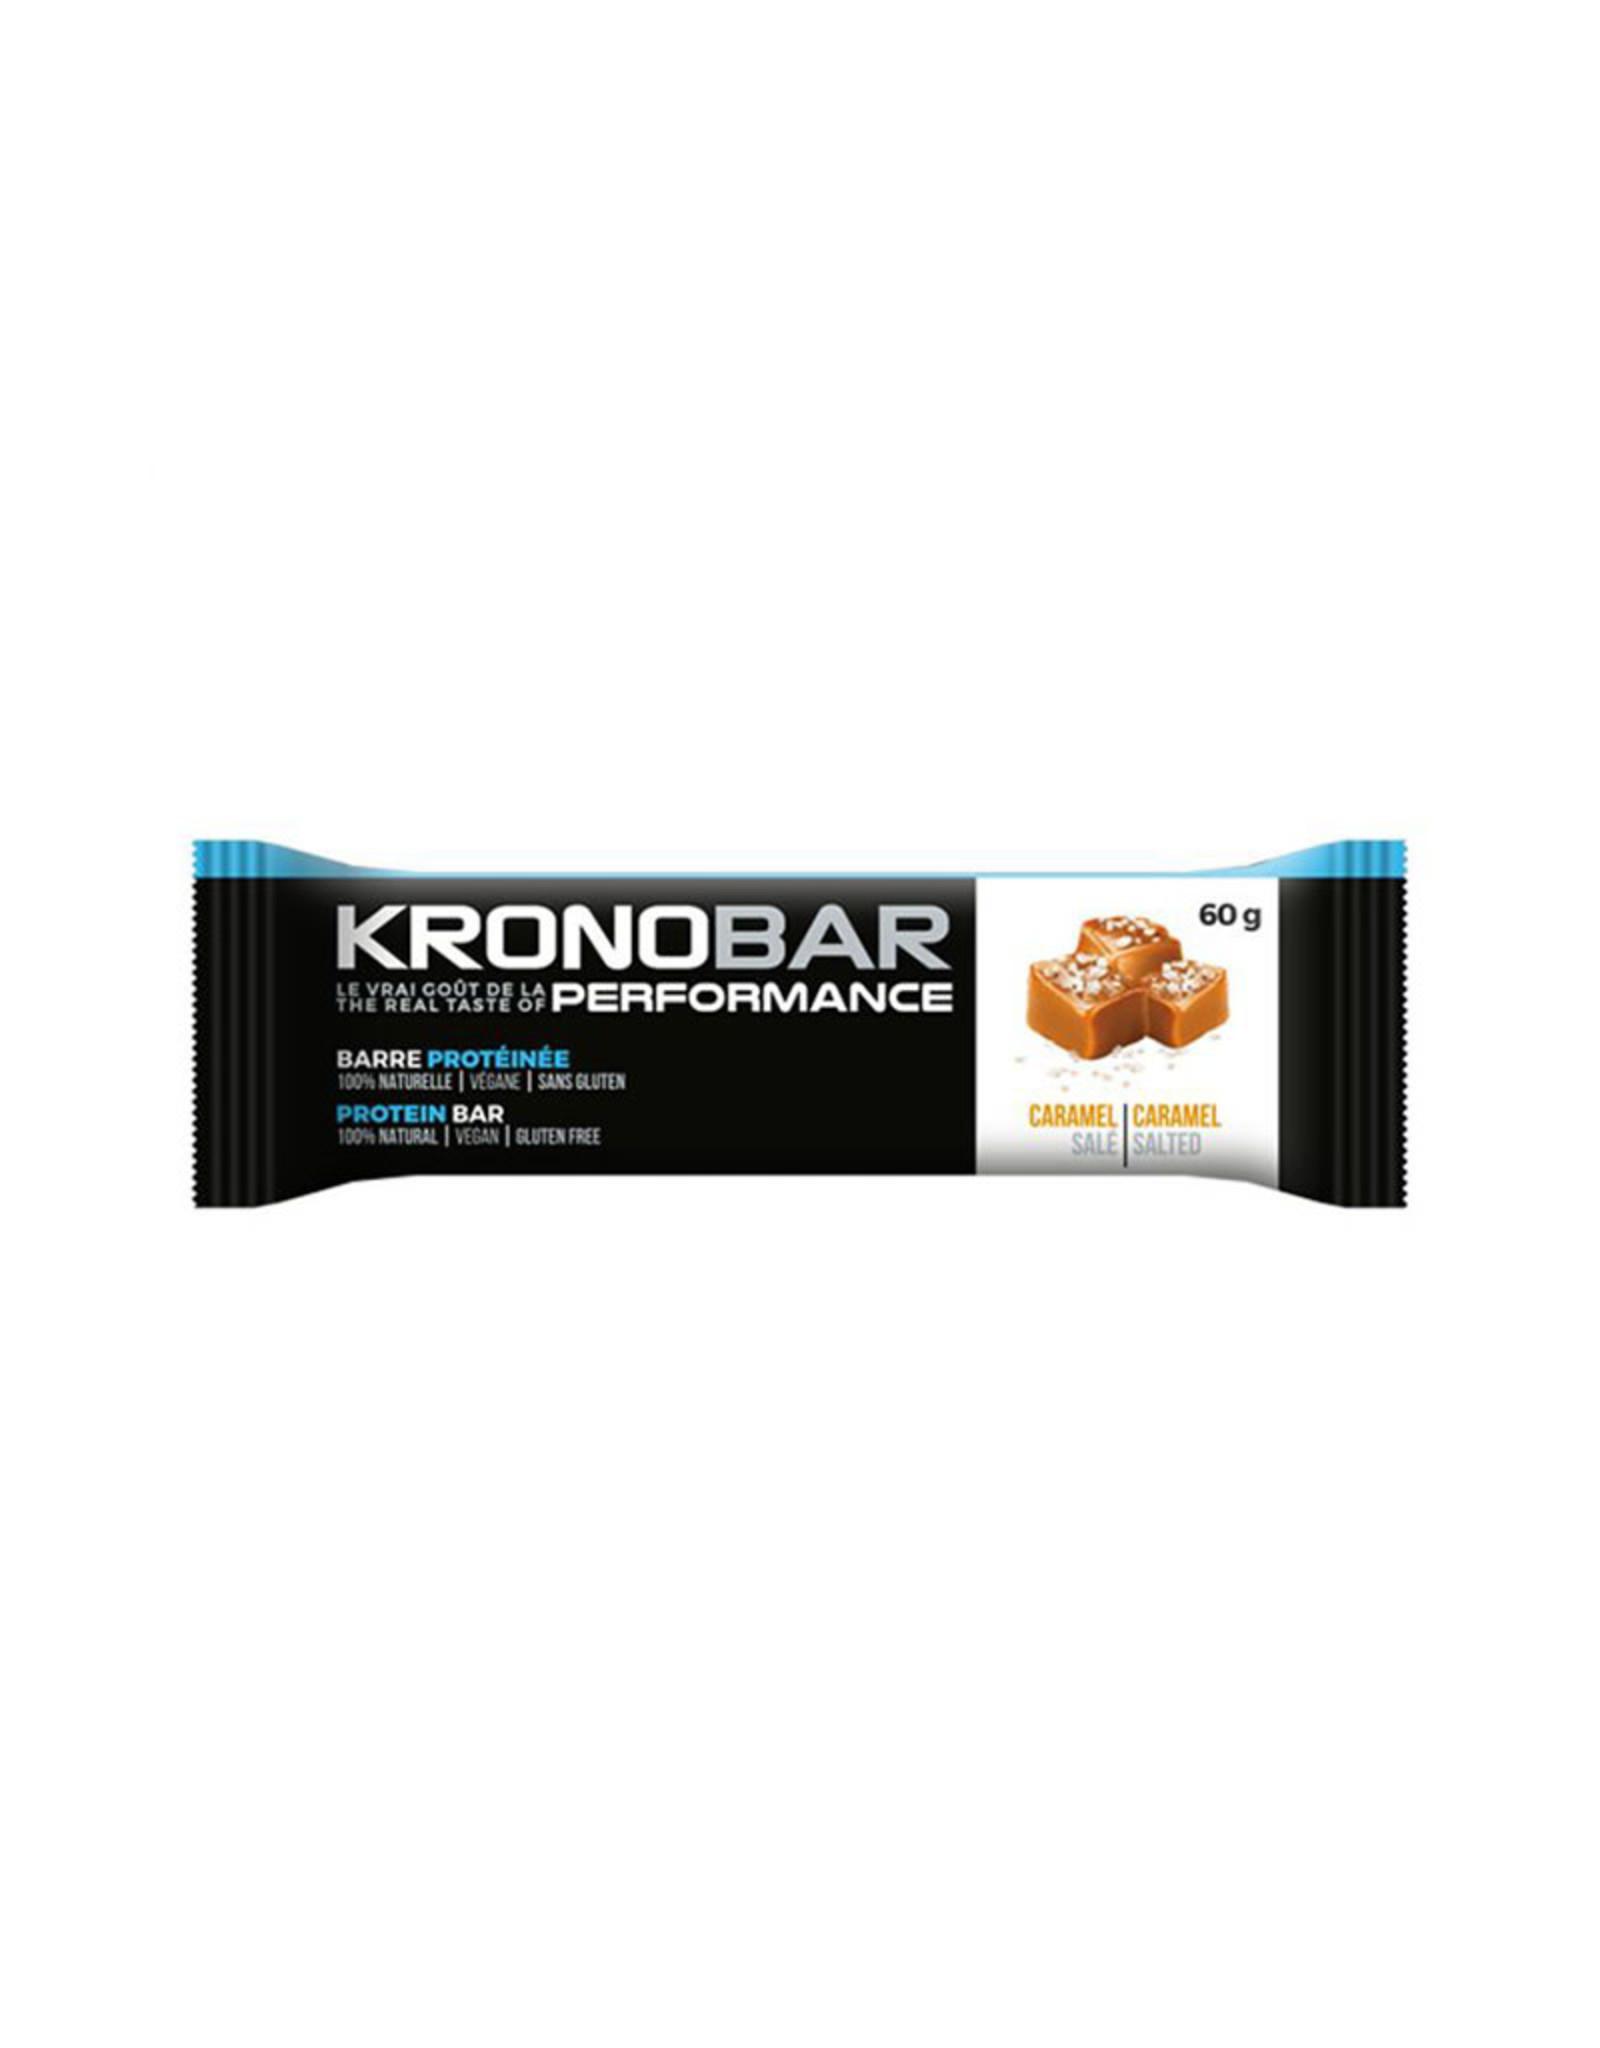 Kronobar Kronobar - Barre Énergétique, Caramel Salé (60g)